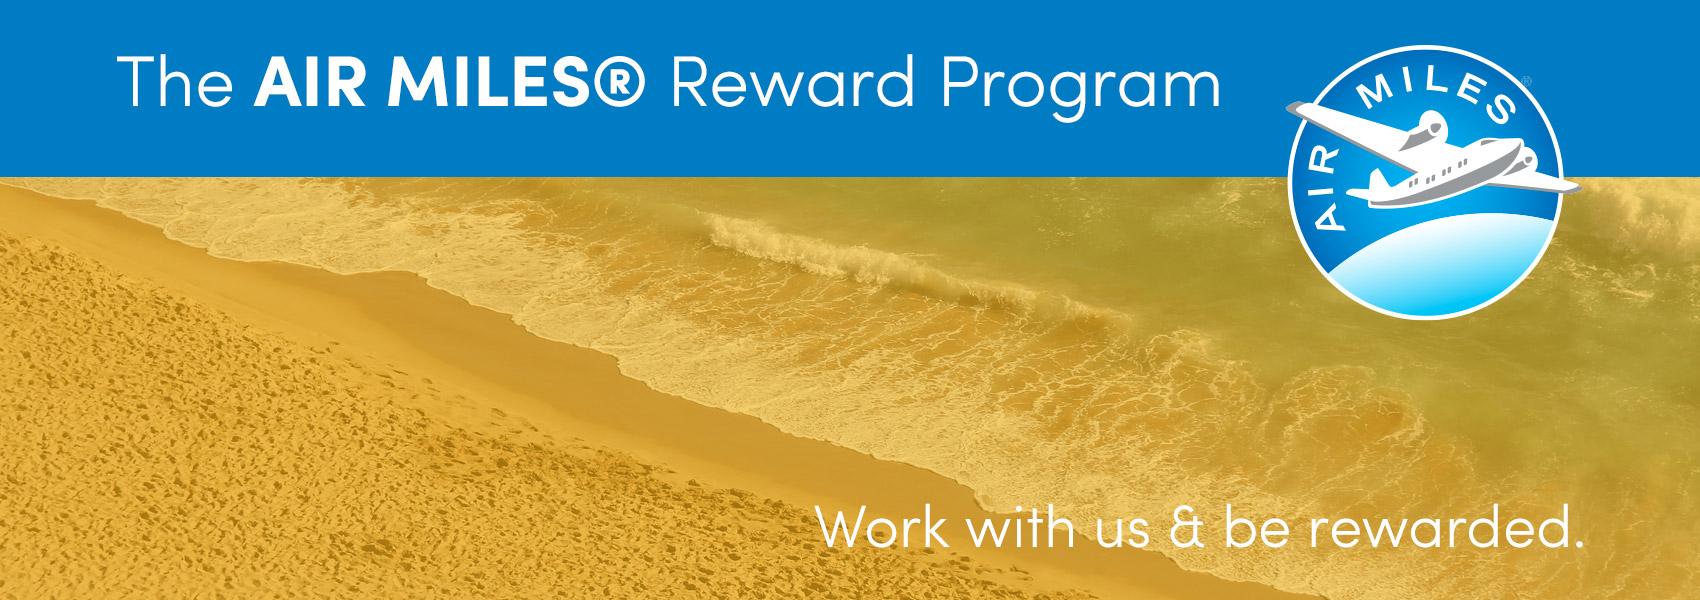 The AIR MILES® Reward Program